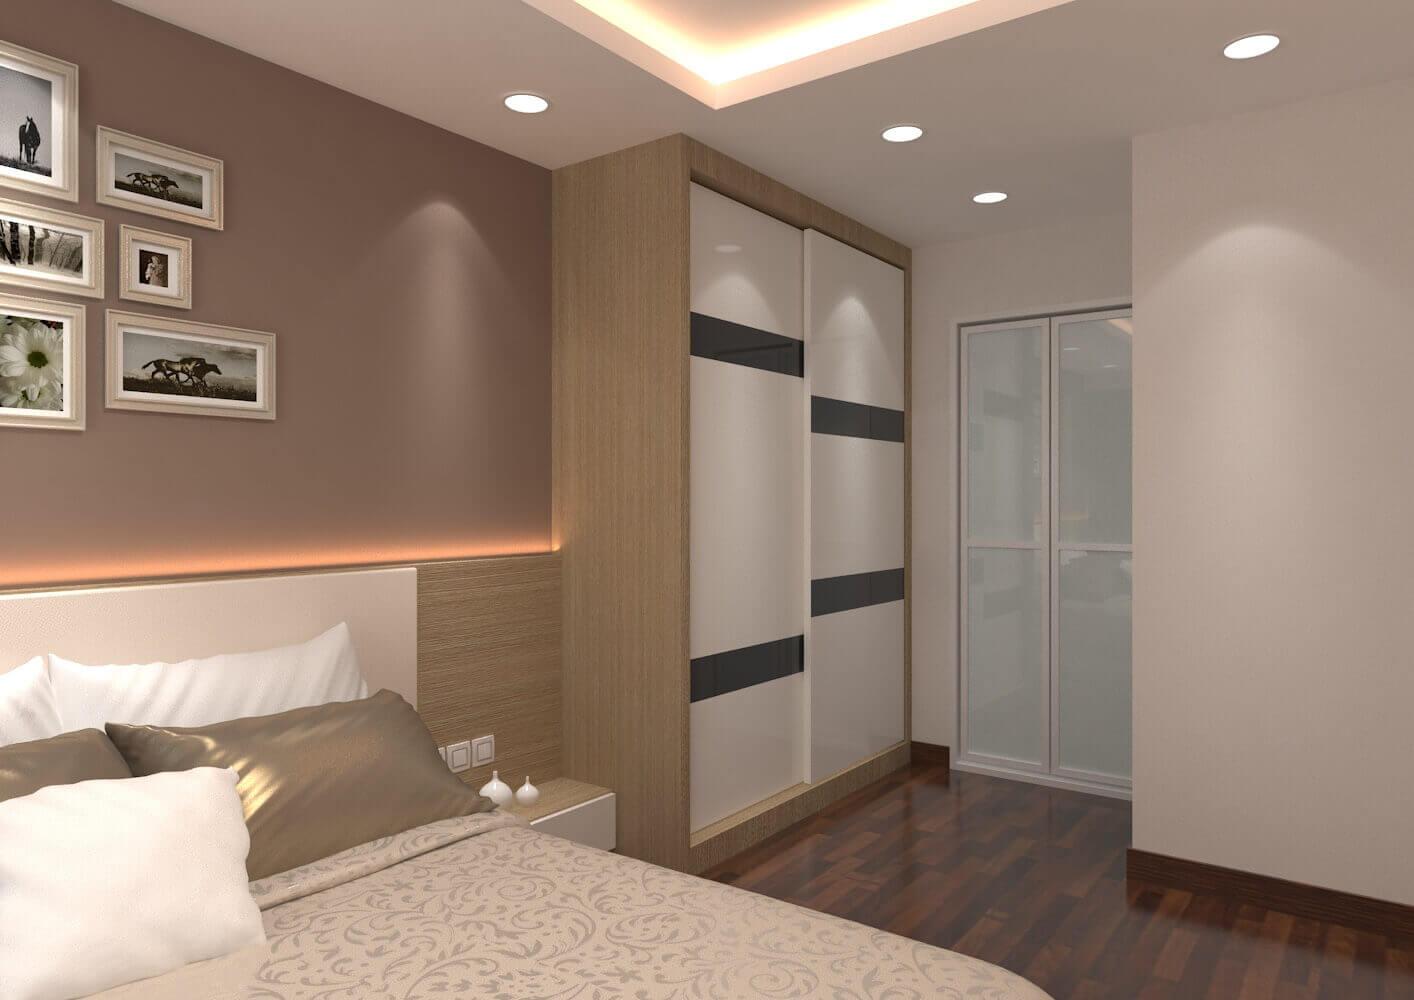 Main bedroom laurus design pte ltd for Main bedroom ideas